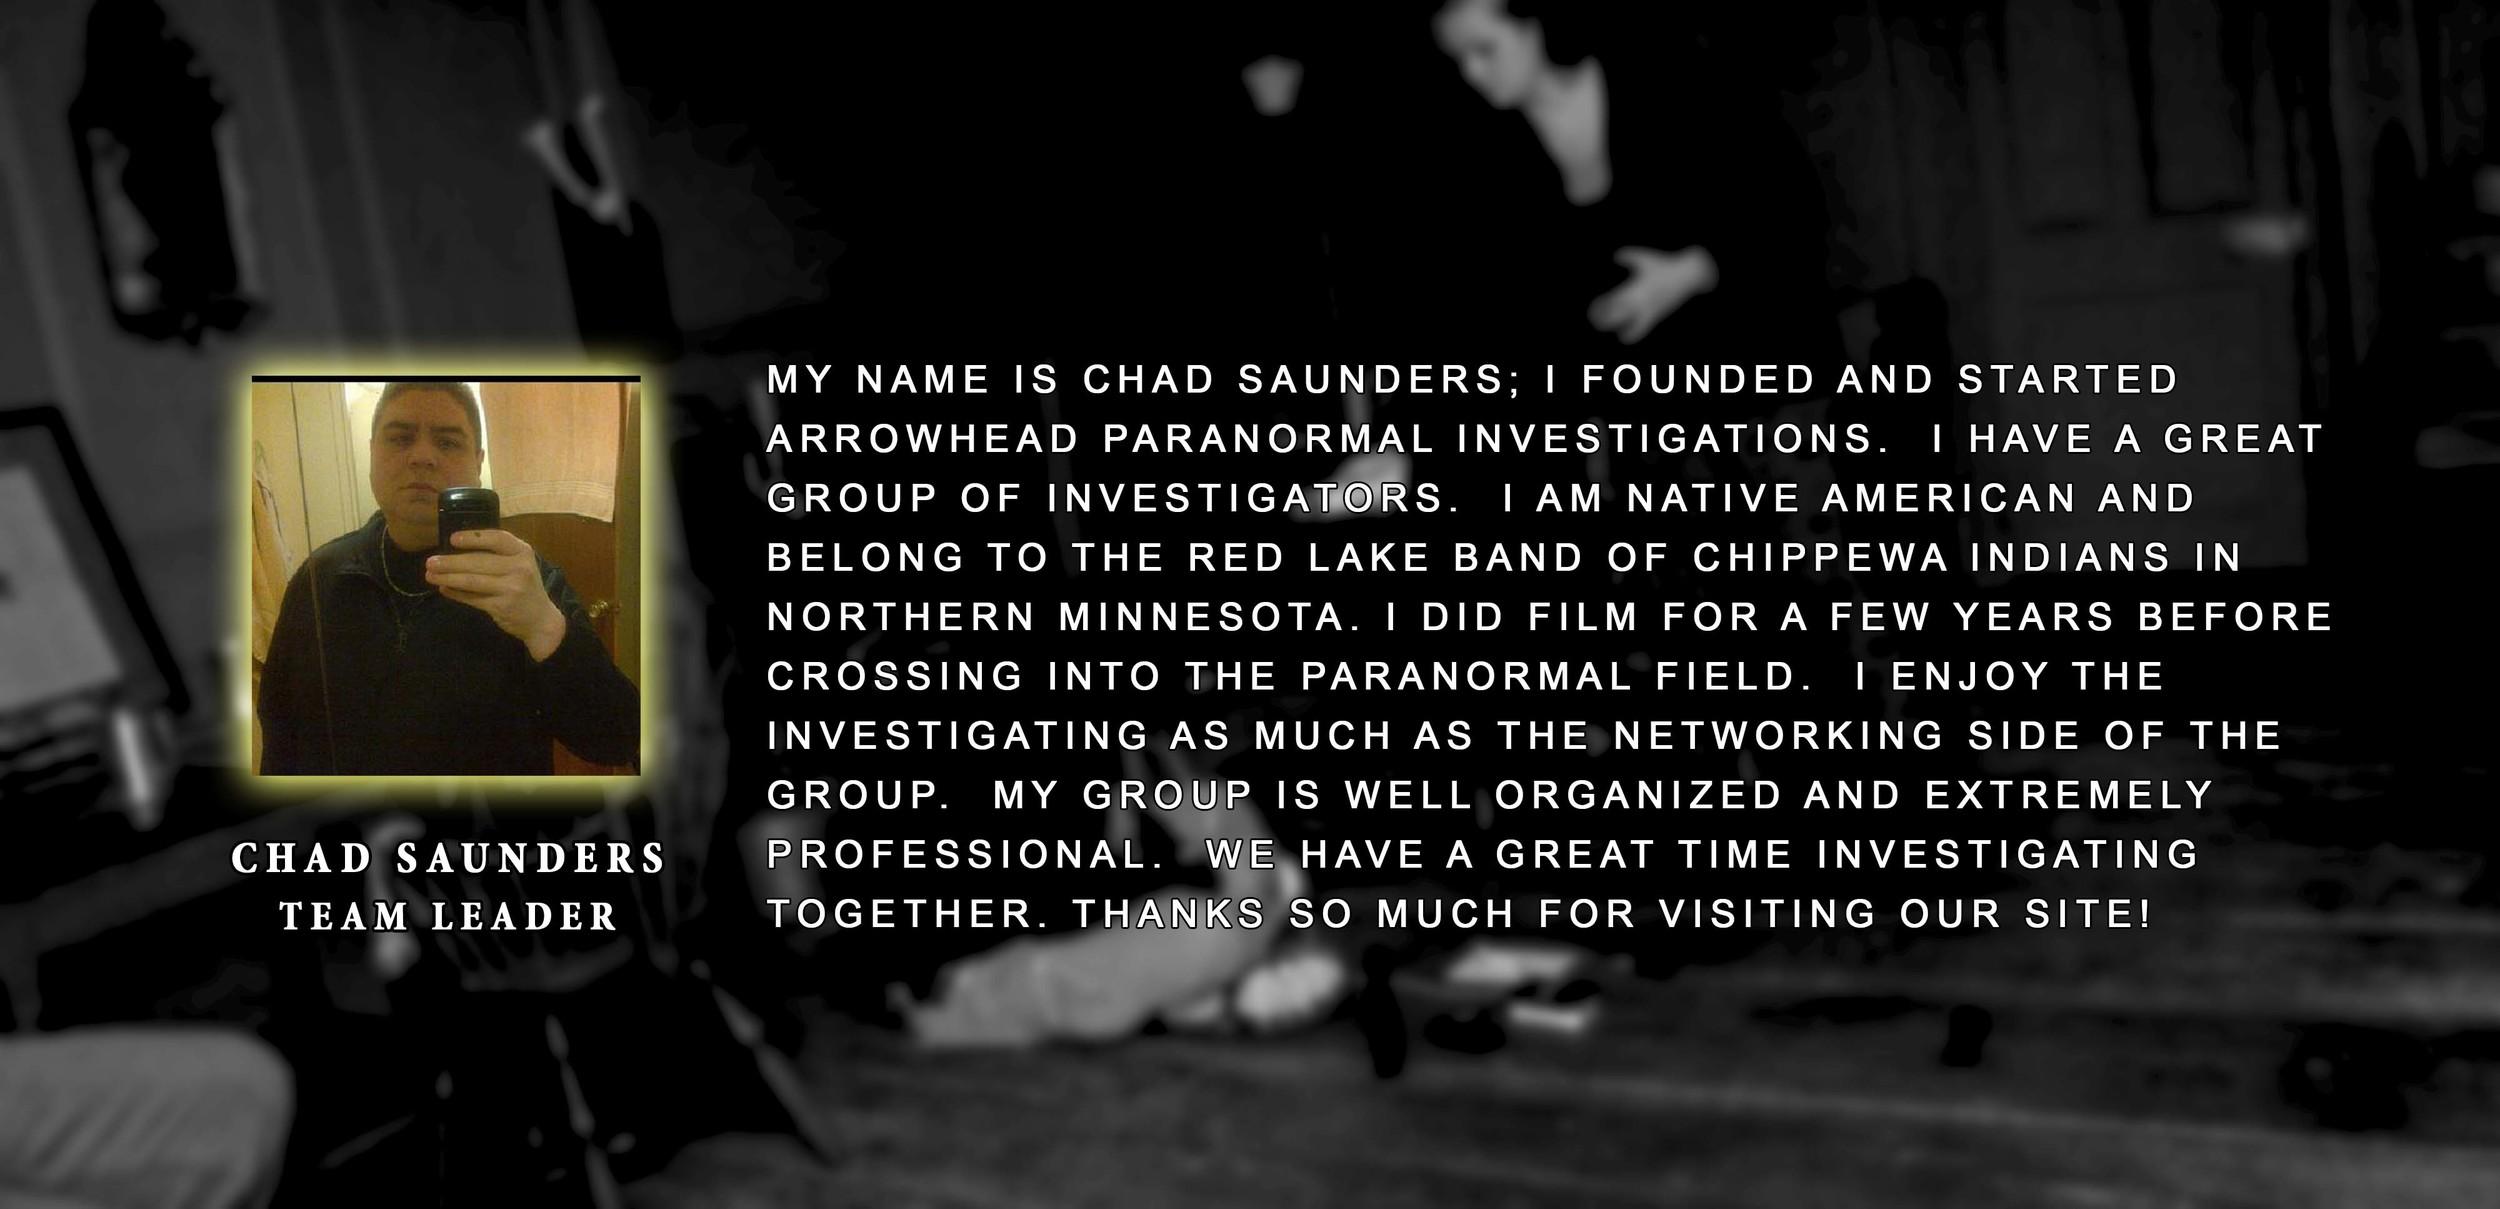 Chad_Saunders.jpg